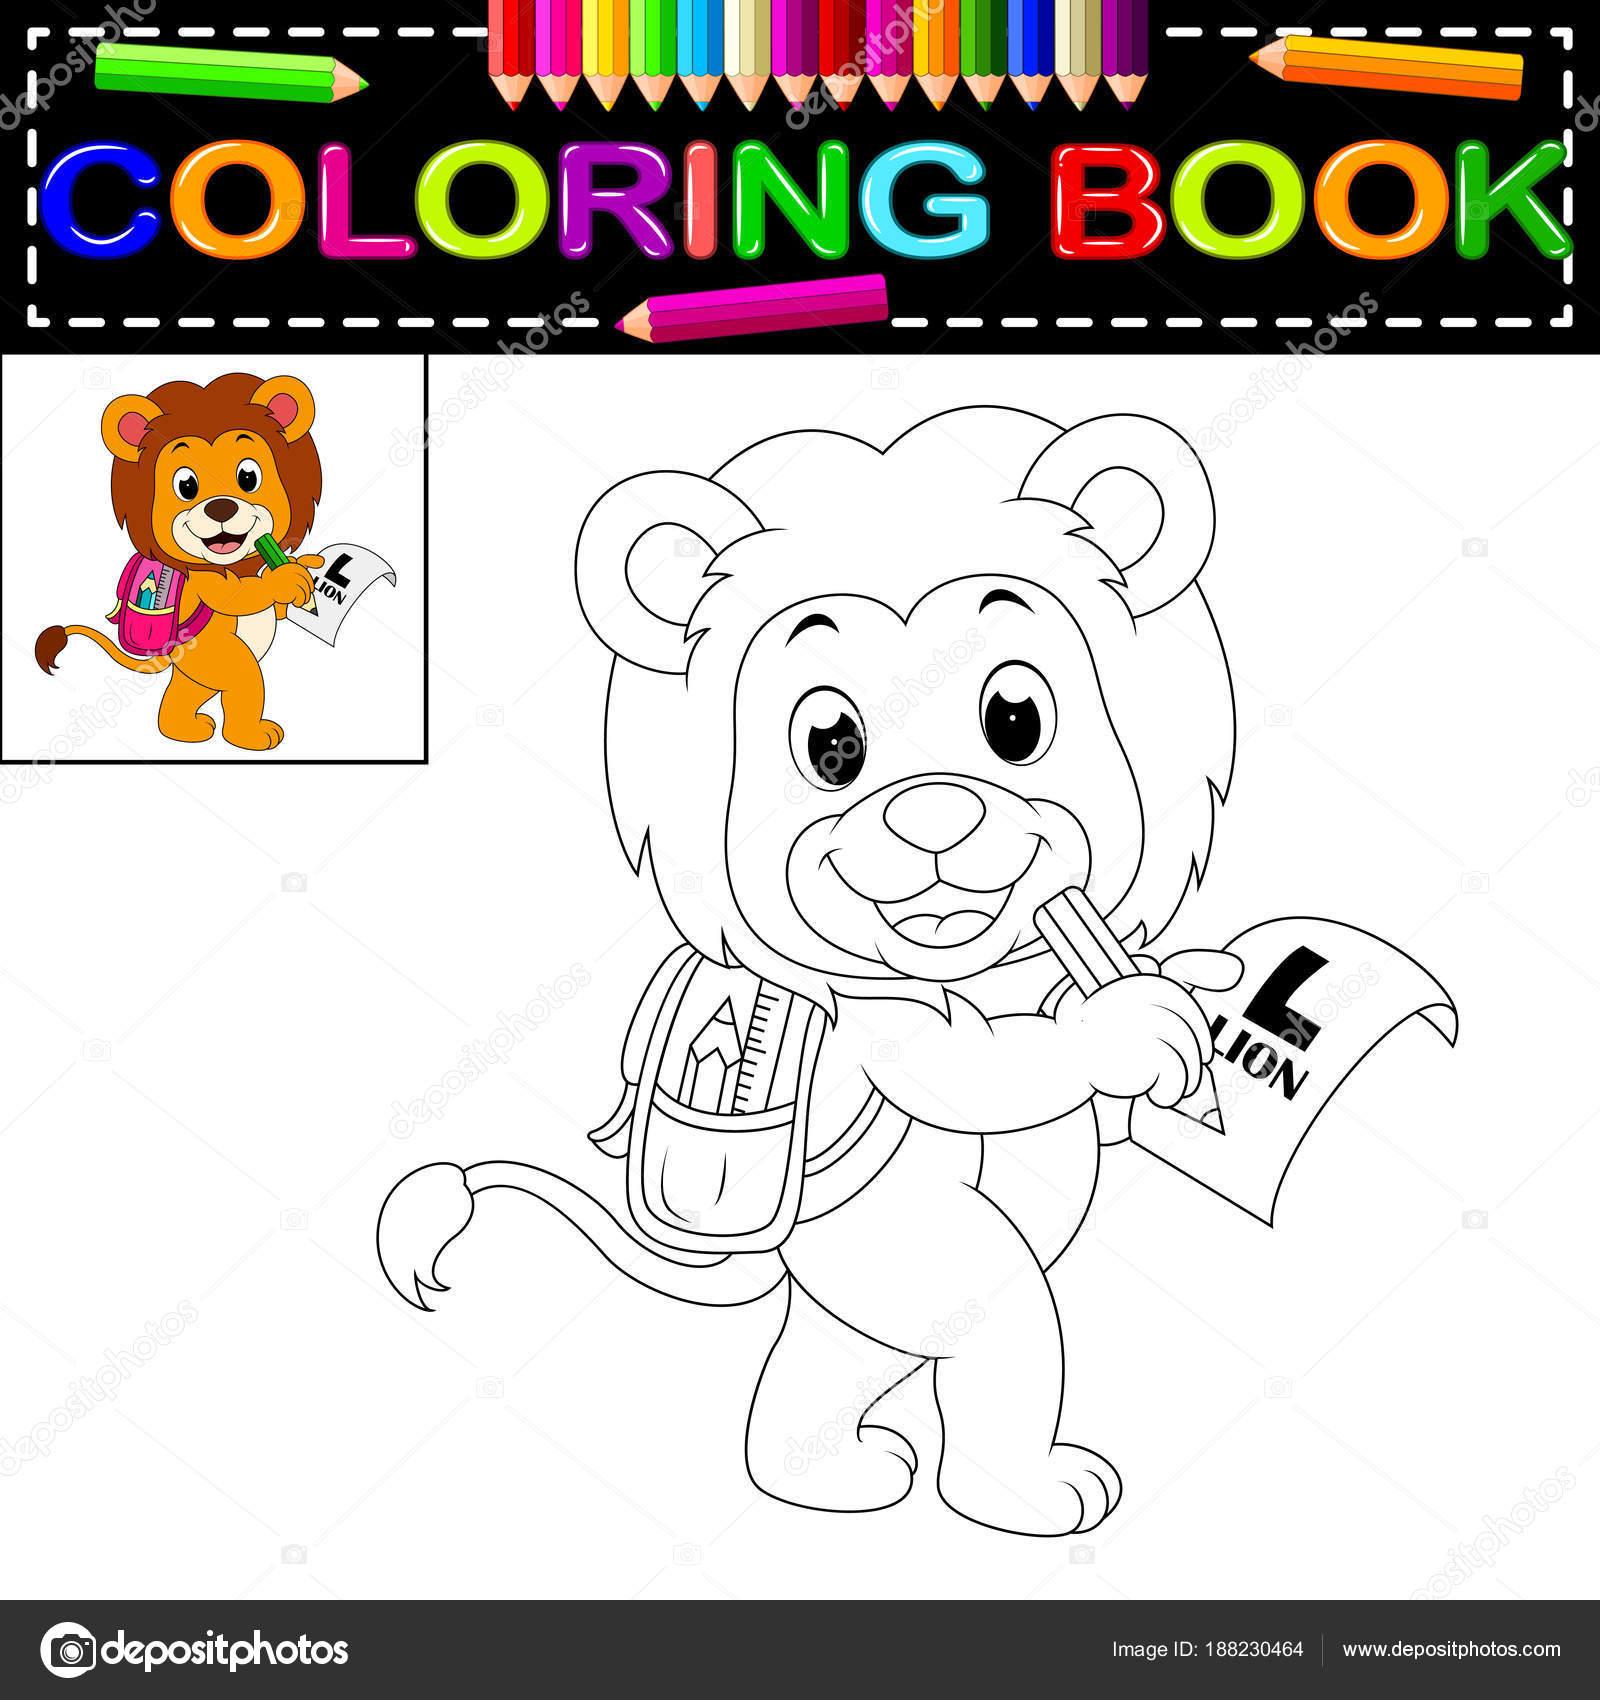 Süße Löwen Malbuch — Stockvektor © hermandesign2015@gmail.com #188230464